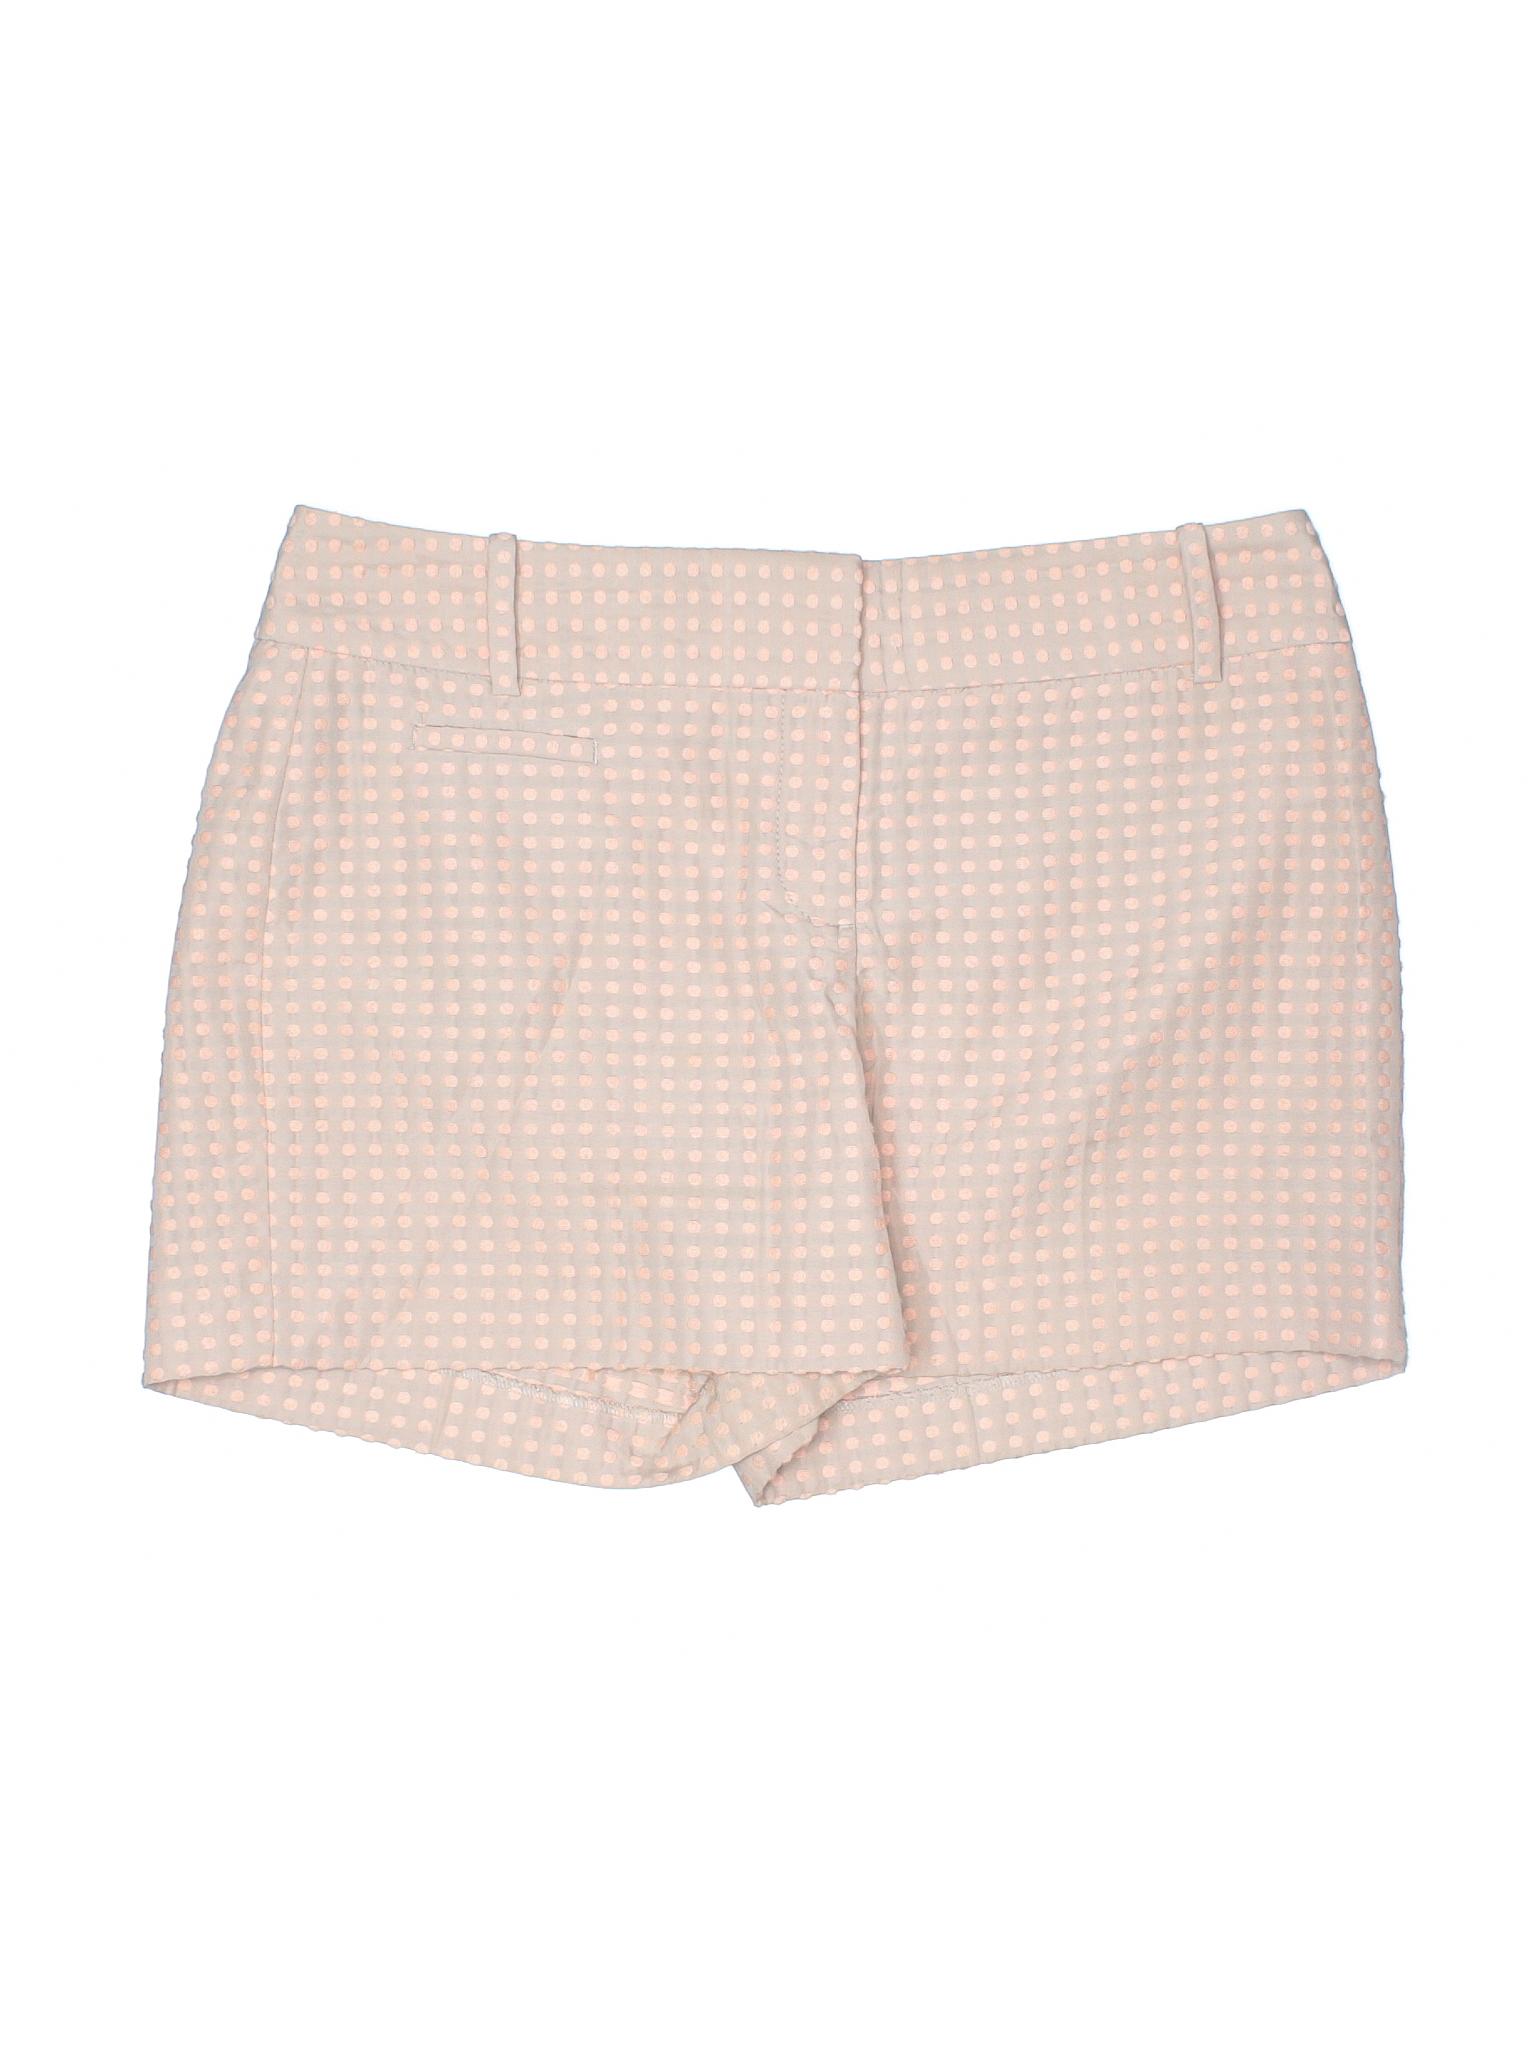 Boutique Ann Shorts Taylor winter Dressy LOFT q0xqv6H